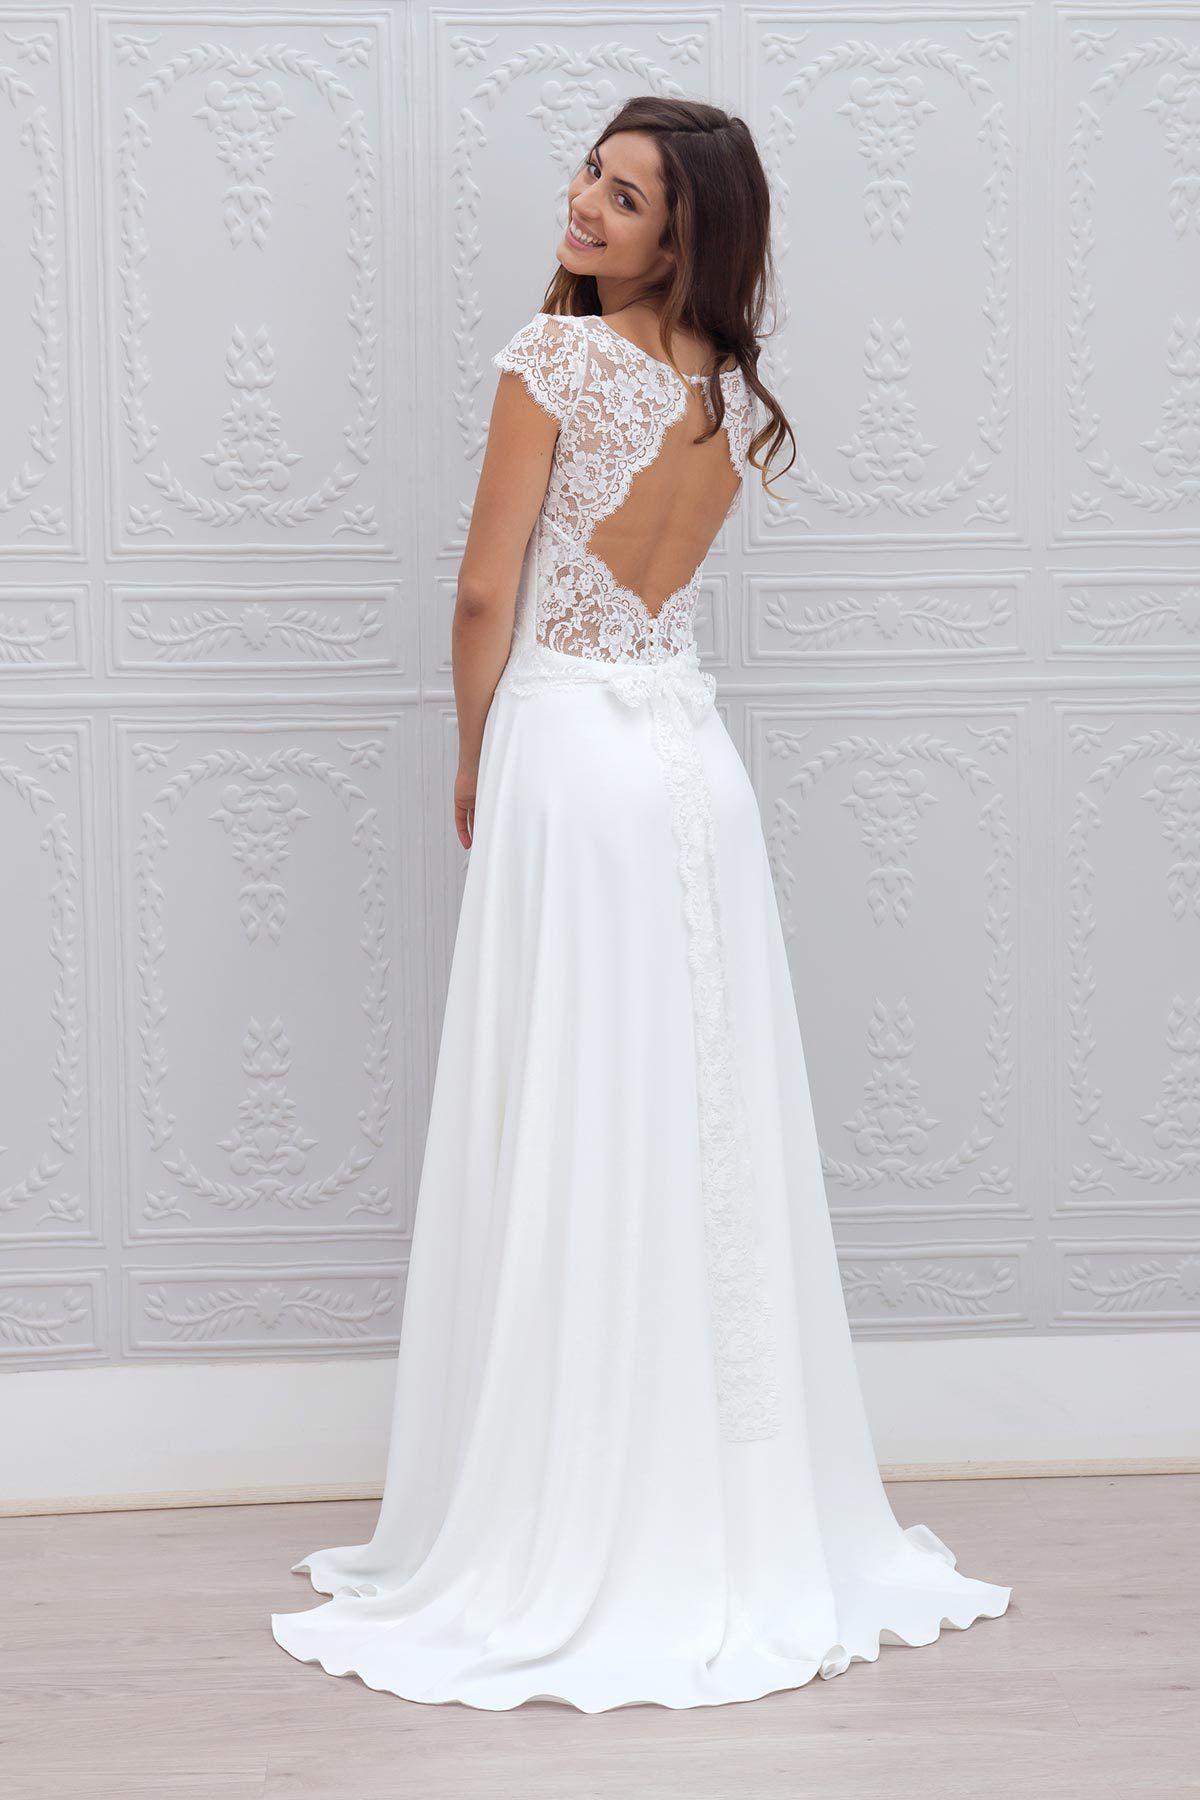 Marie laporte robes de mariée wedding dresses beautiful